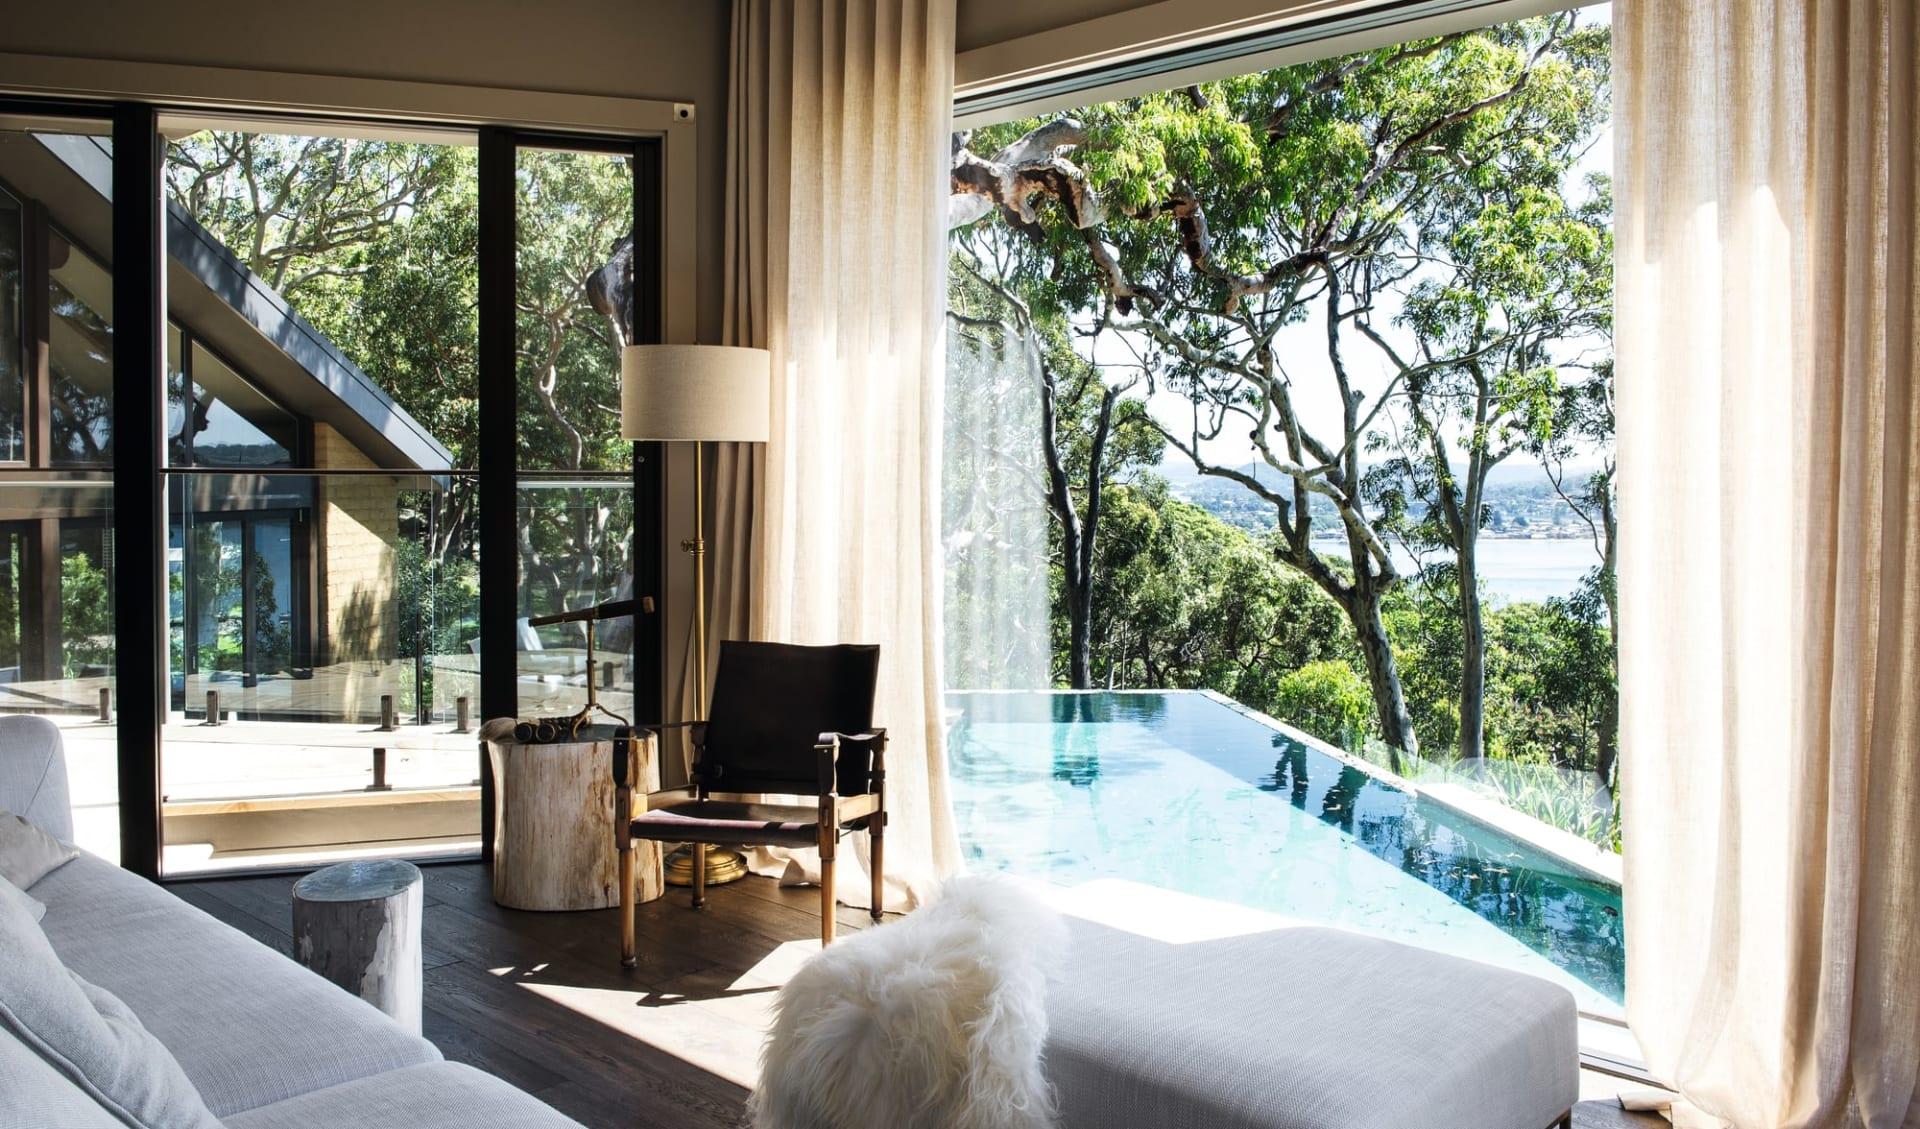 Pretty Beach House: Zimmer Pretty Beach House NSW Australien  Living Area 2017